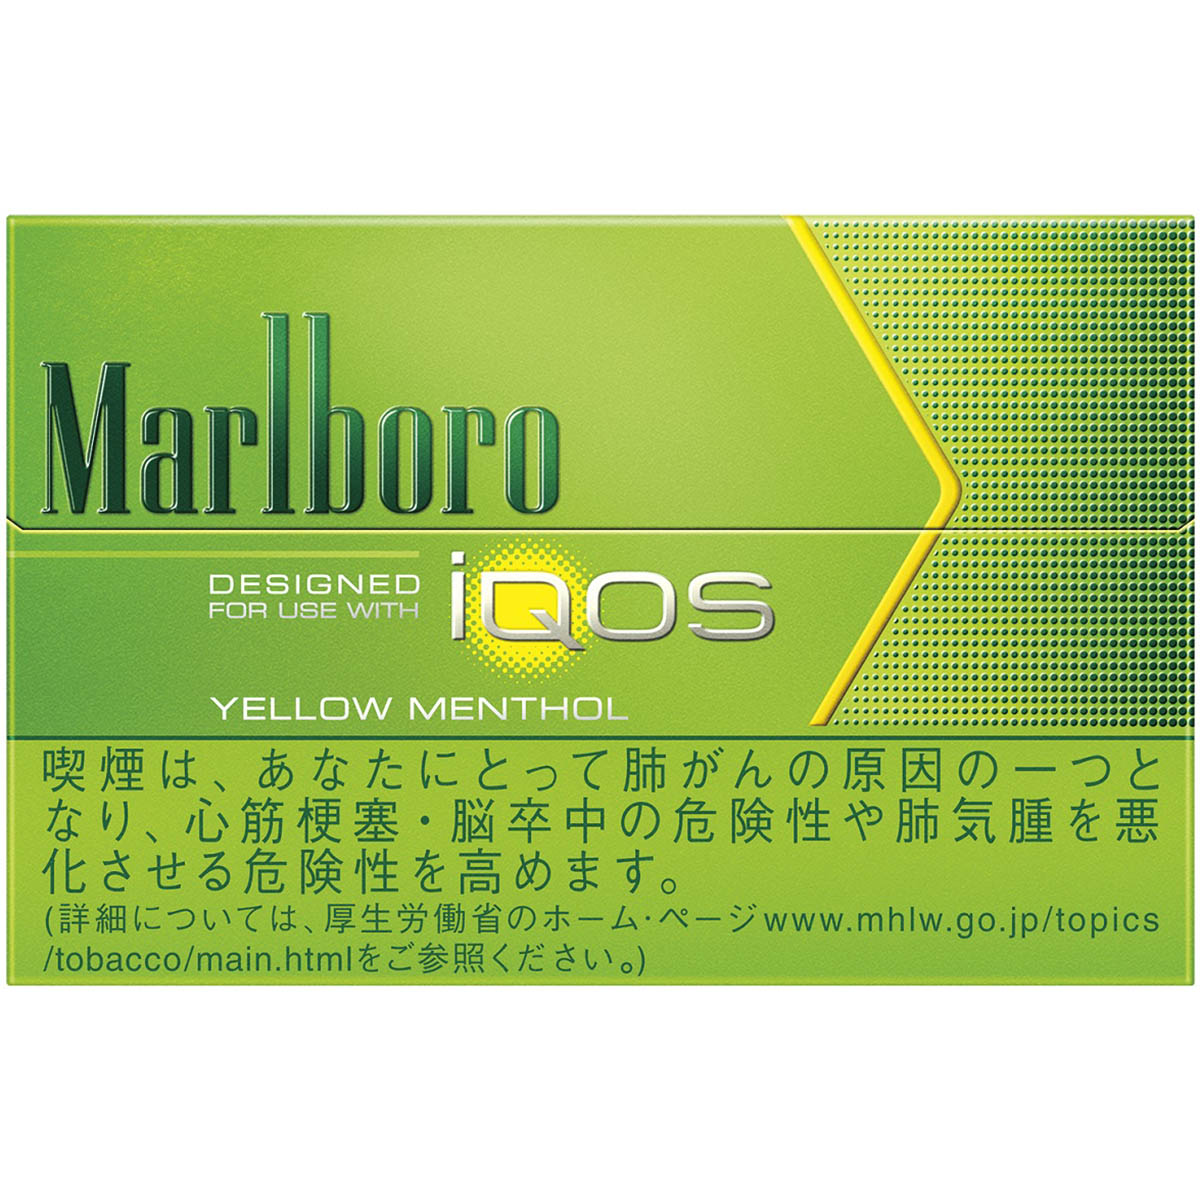 Marlboro - Yellow Menthol